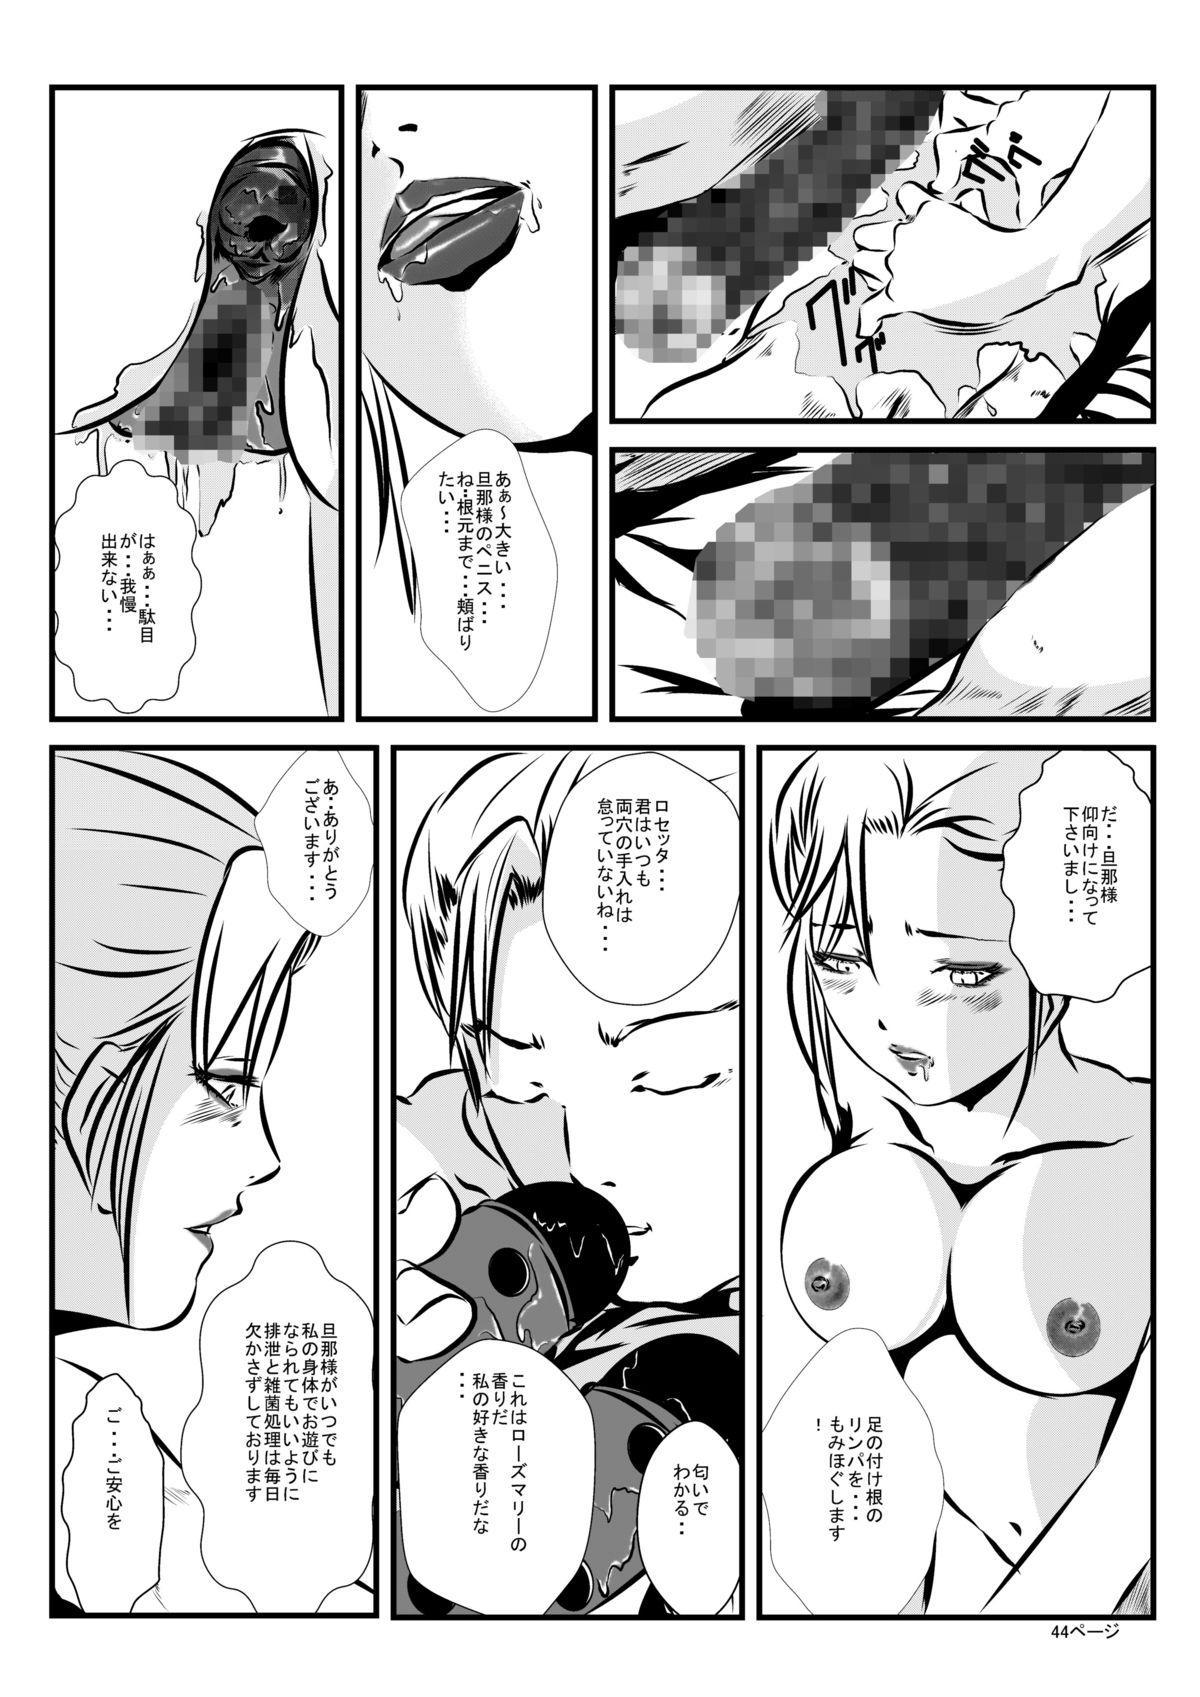 Loli Type no Jikkensitsu 42